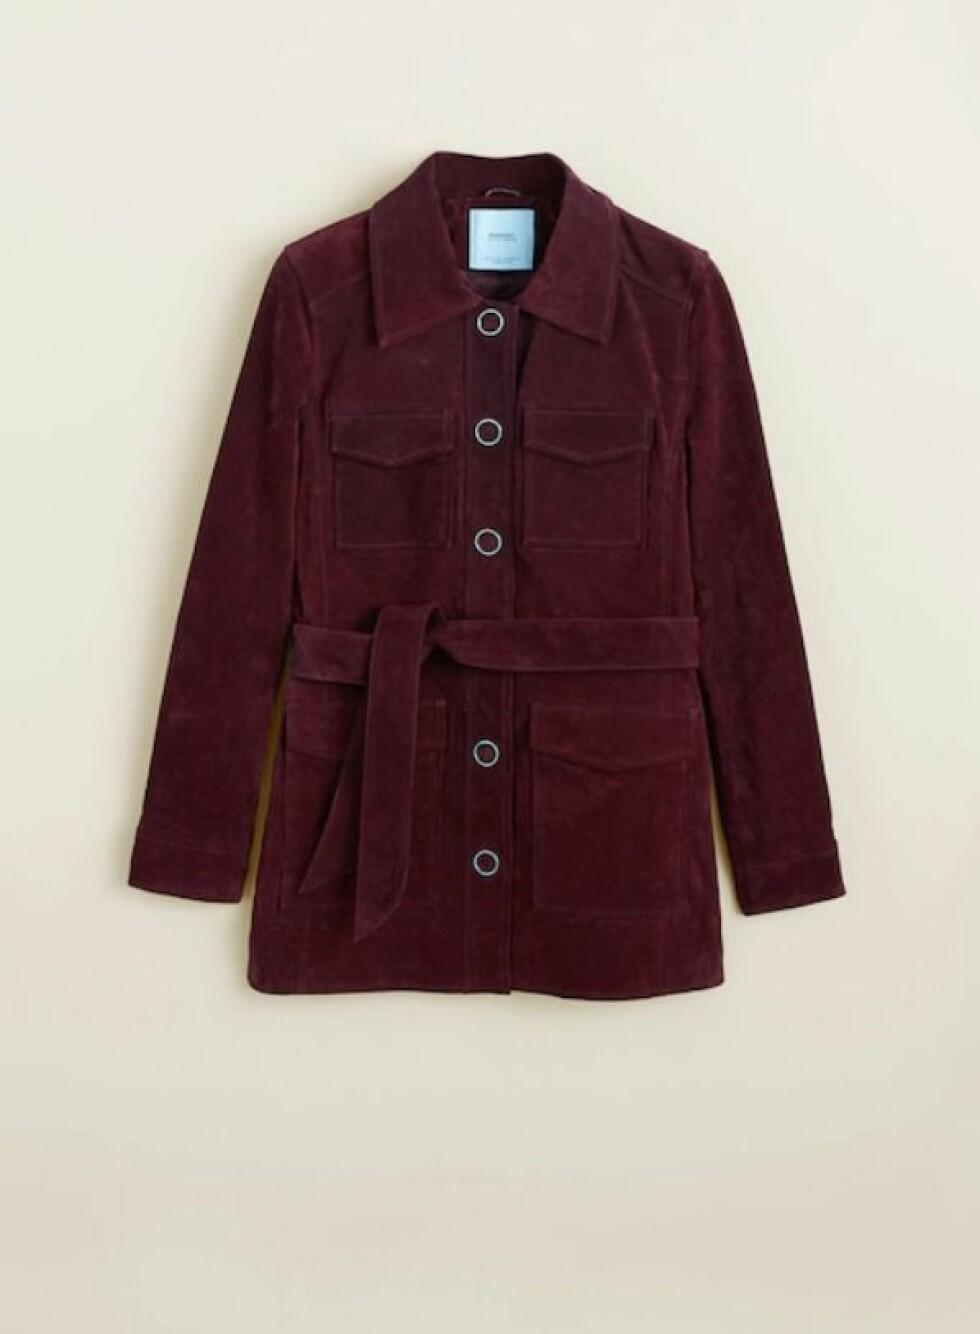 <strong>Skinnjakke fra Mango  1400,-  https:</strong>//shop.mango.com/no-en/women/jackets-jackets/pockets-leather-jacket_33053802.html?c=76&n=1&s=prendas_she.familia;16,304